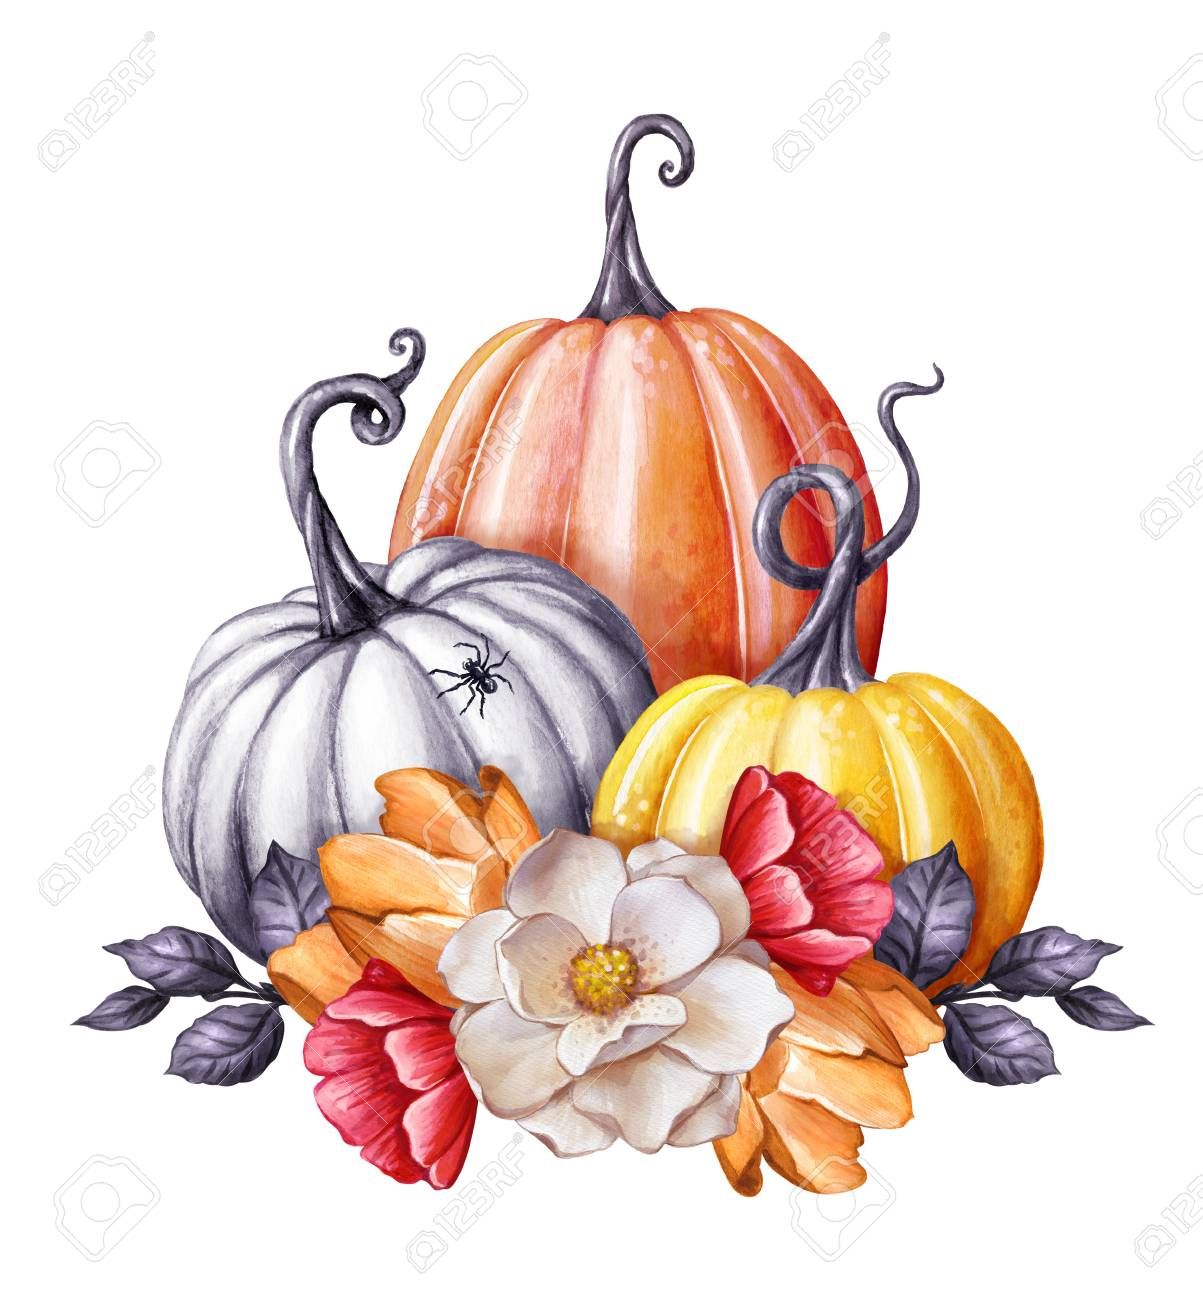 Aquarell Illustration Blumenkürbisse Halloween Clipart Herbst